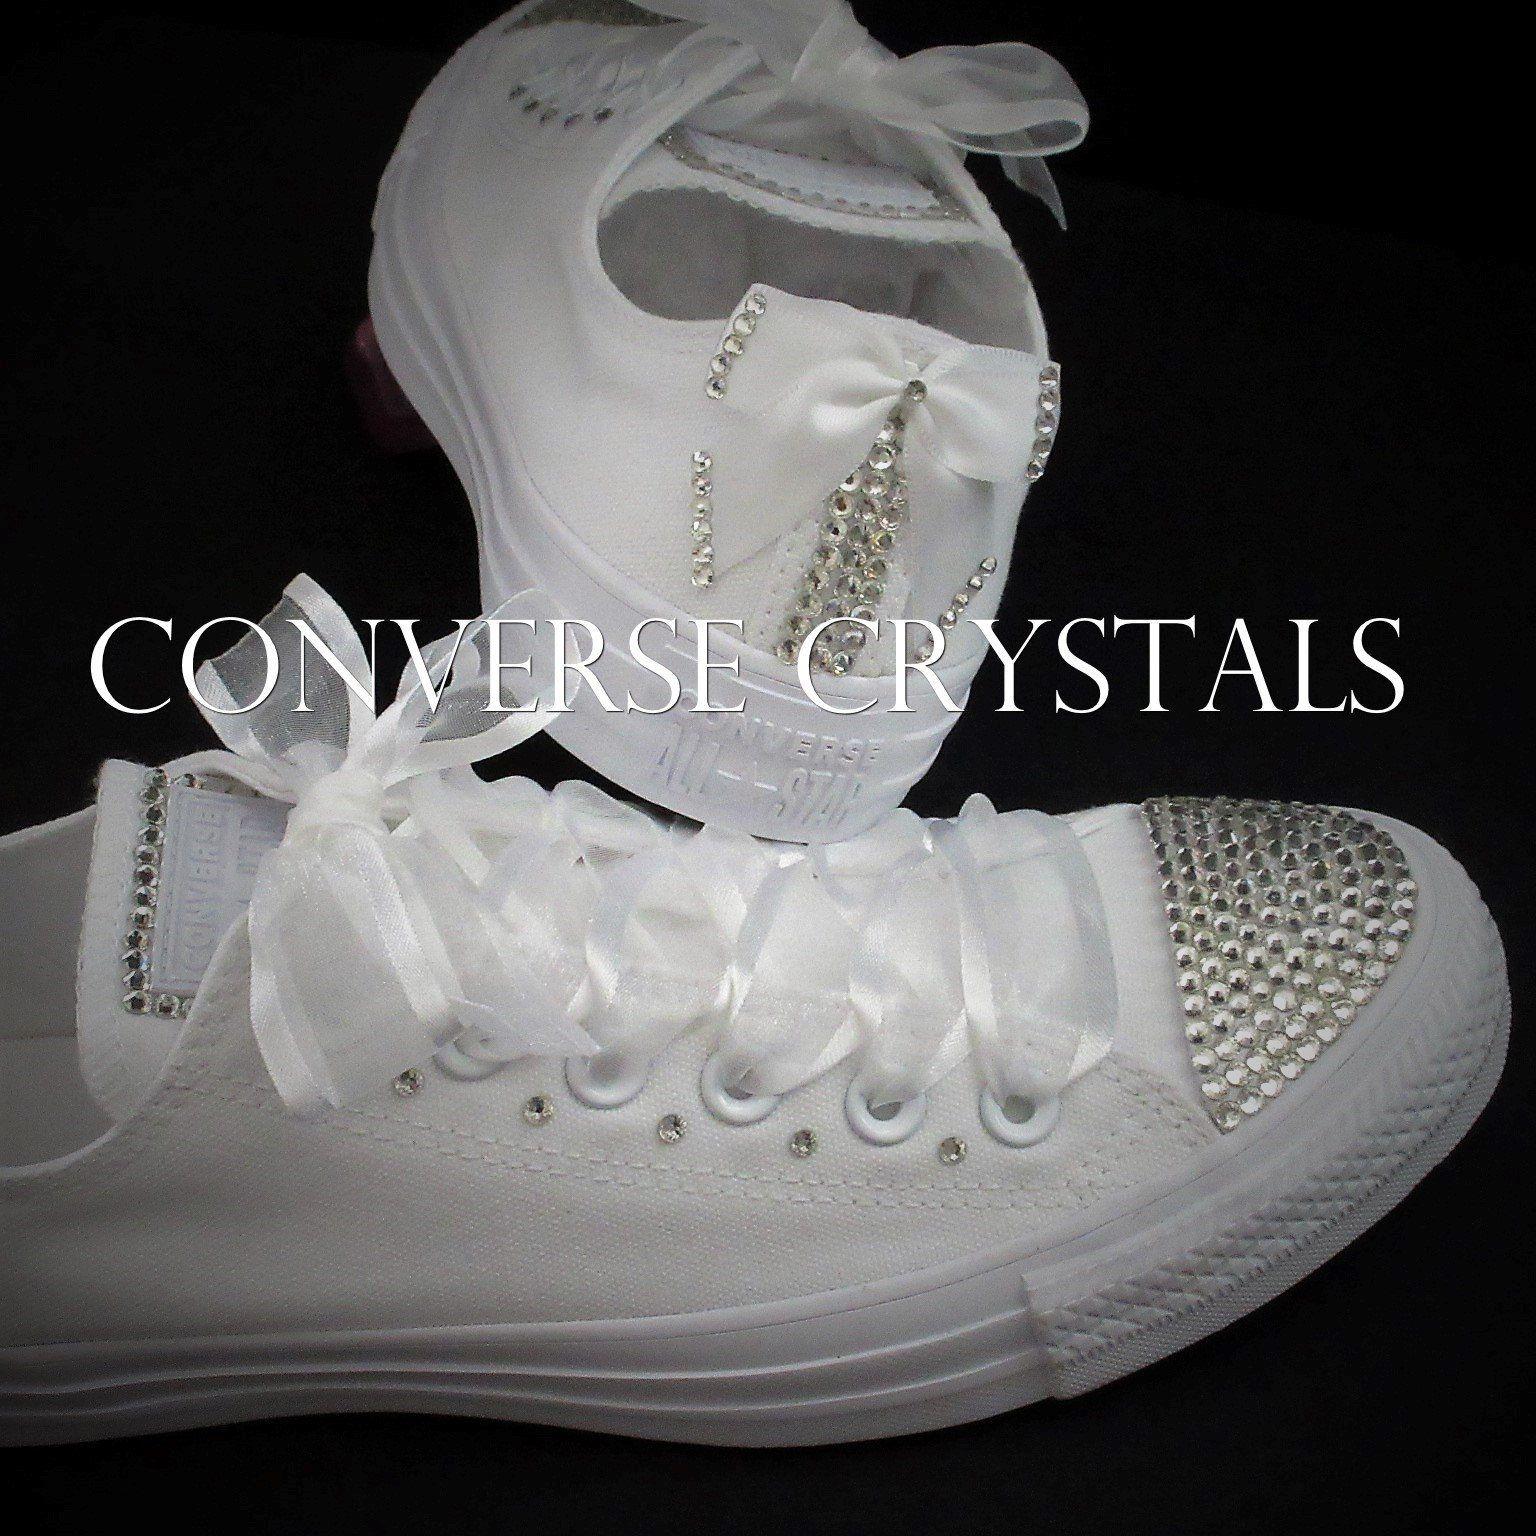 b6da07707c60 Bridal   Wedding Mono White Custom Converse Sizes UK Sizes 3-8 US 5-10  EU  35- 41.5 Incl Half Sizes by ConverseCrystals on Etsy